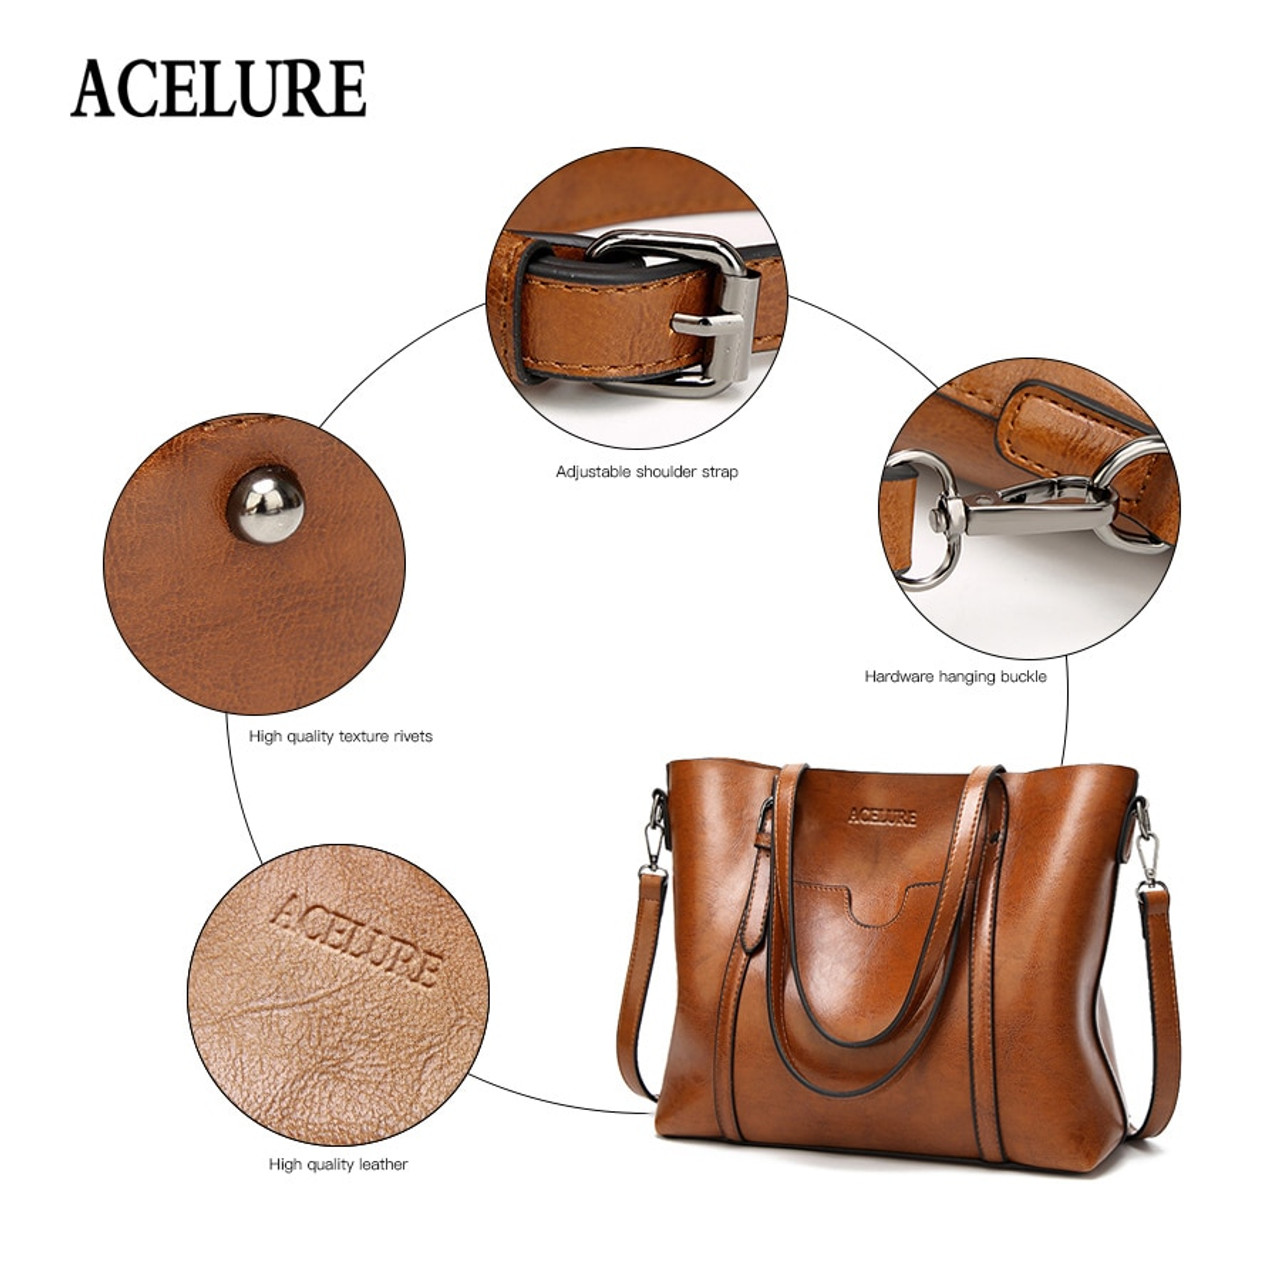 43dcba0e1 ... ACELURE Women bag Oil wax Women's Leather Handbags Luxury Lady Hand Bags  With Purse Pocket Women ...